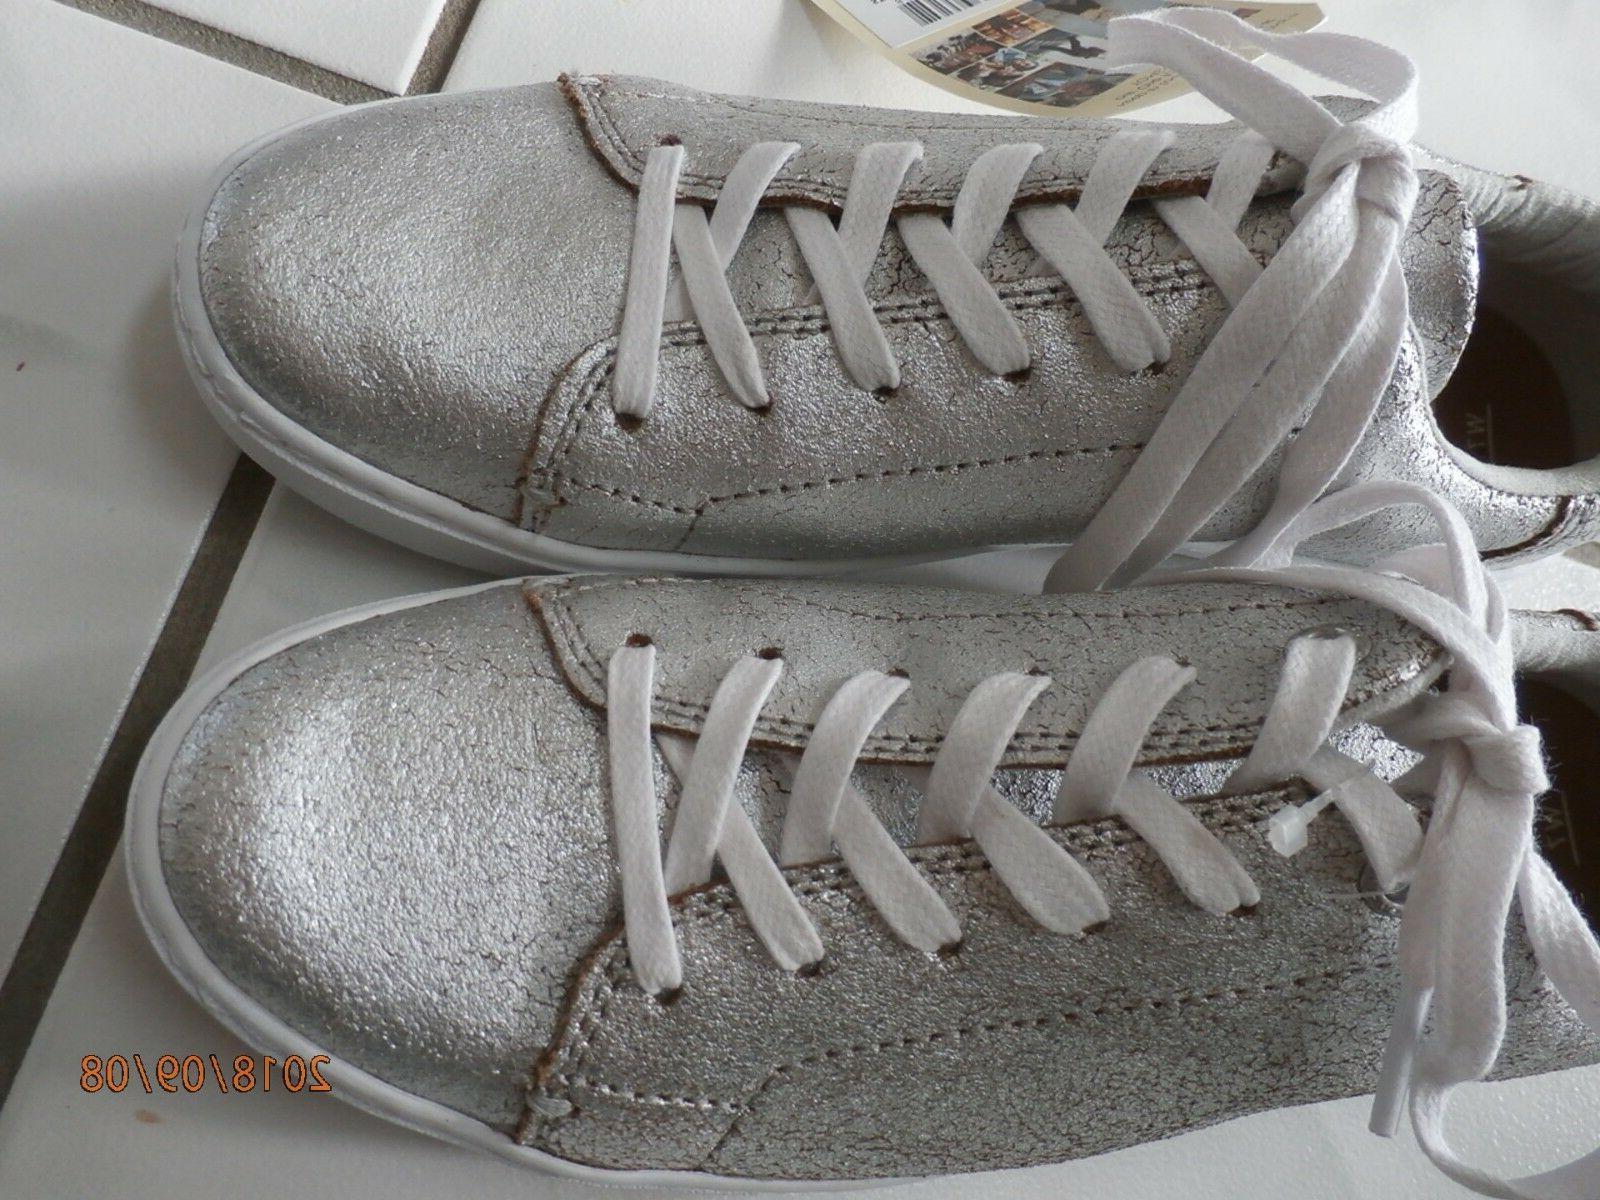 NEW Toms Lenox Sneaker Tennis Shoes Metallic Size New